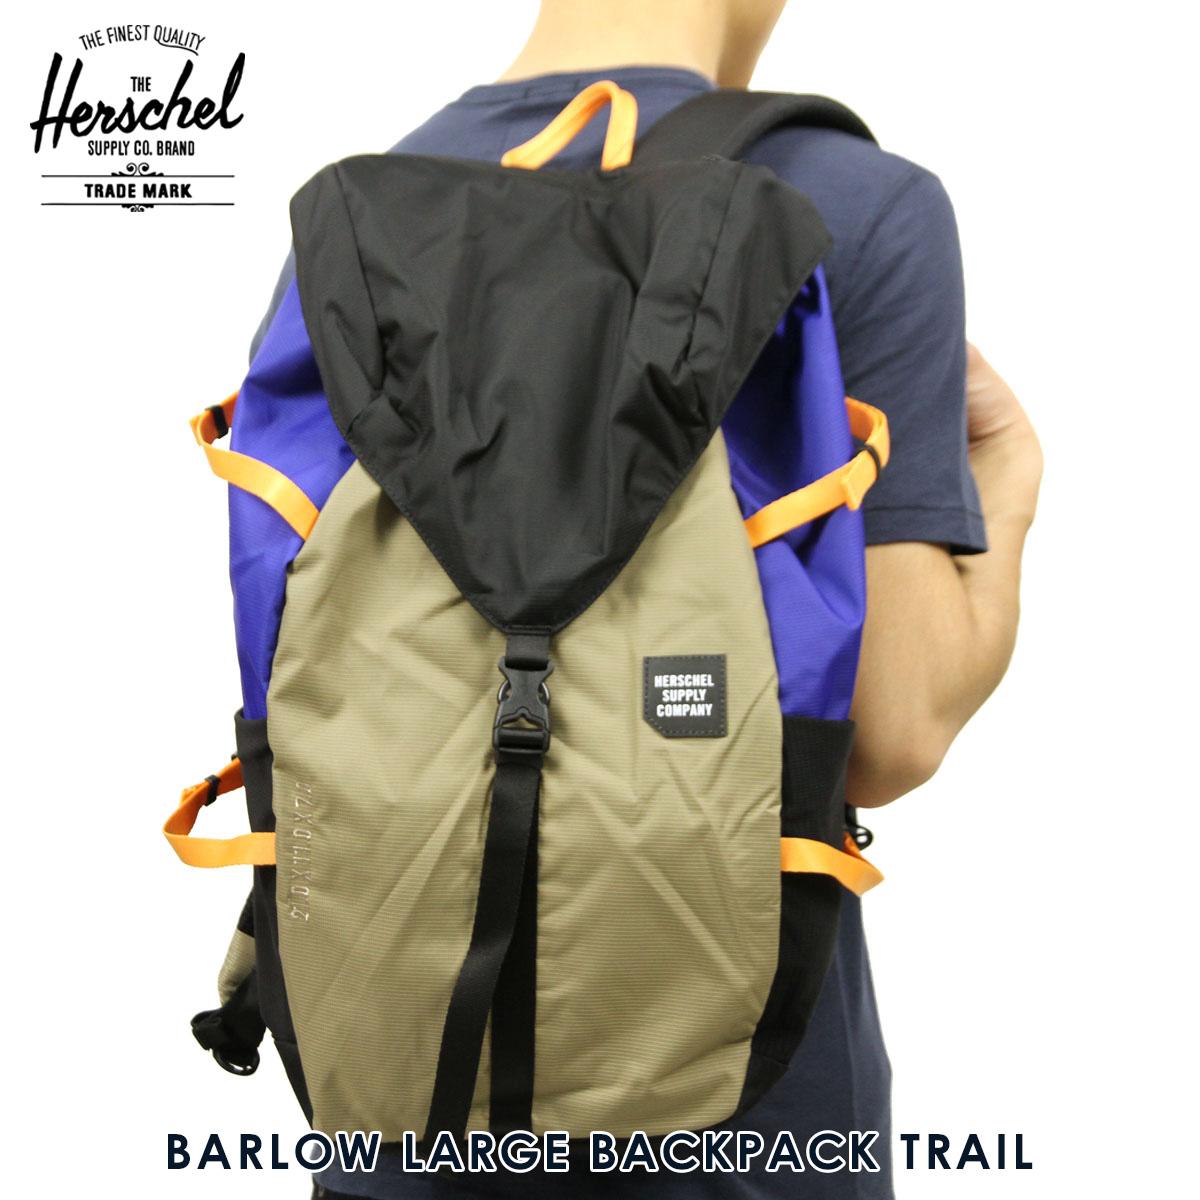 c79bff5b84b Rakuten Ichiba shop MIXON  Hershel supply Herschel Supply regular store backpack  BARLOW LARGE BACKPACK TRAIL 10319-01628-OS BLACK BRINDLE SURF THE WEB 31.5L  ...